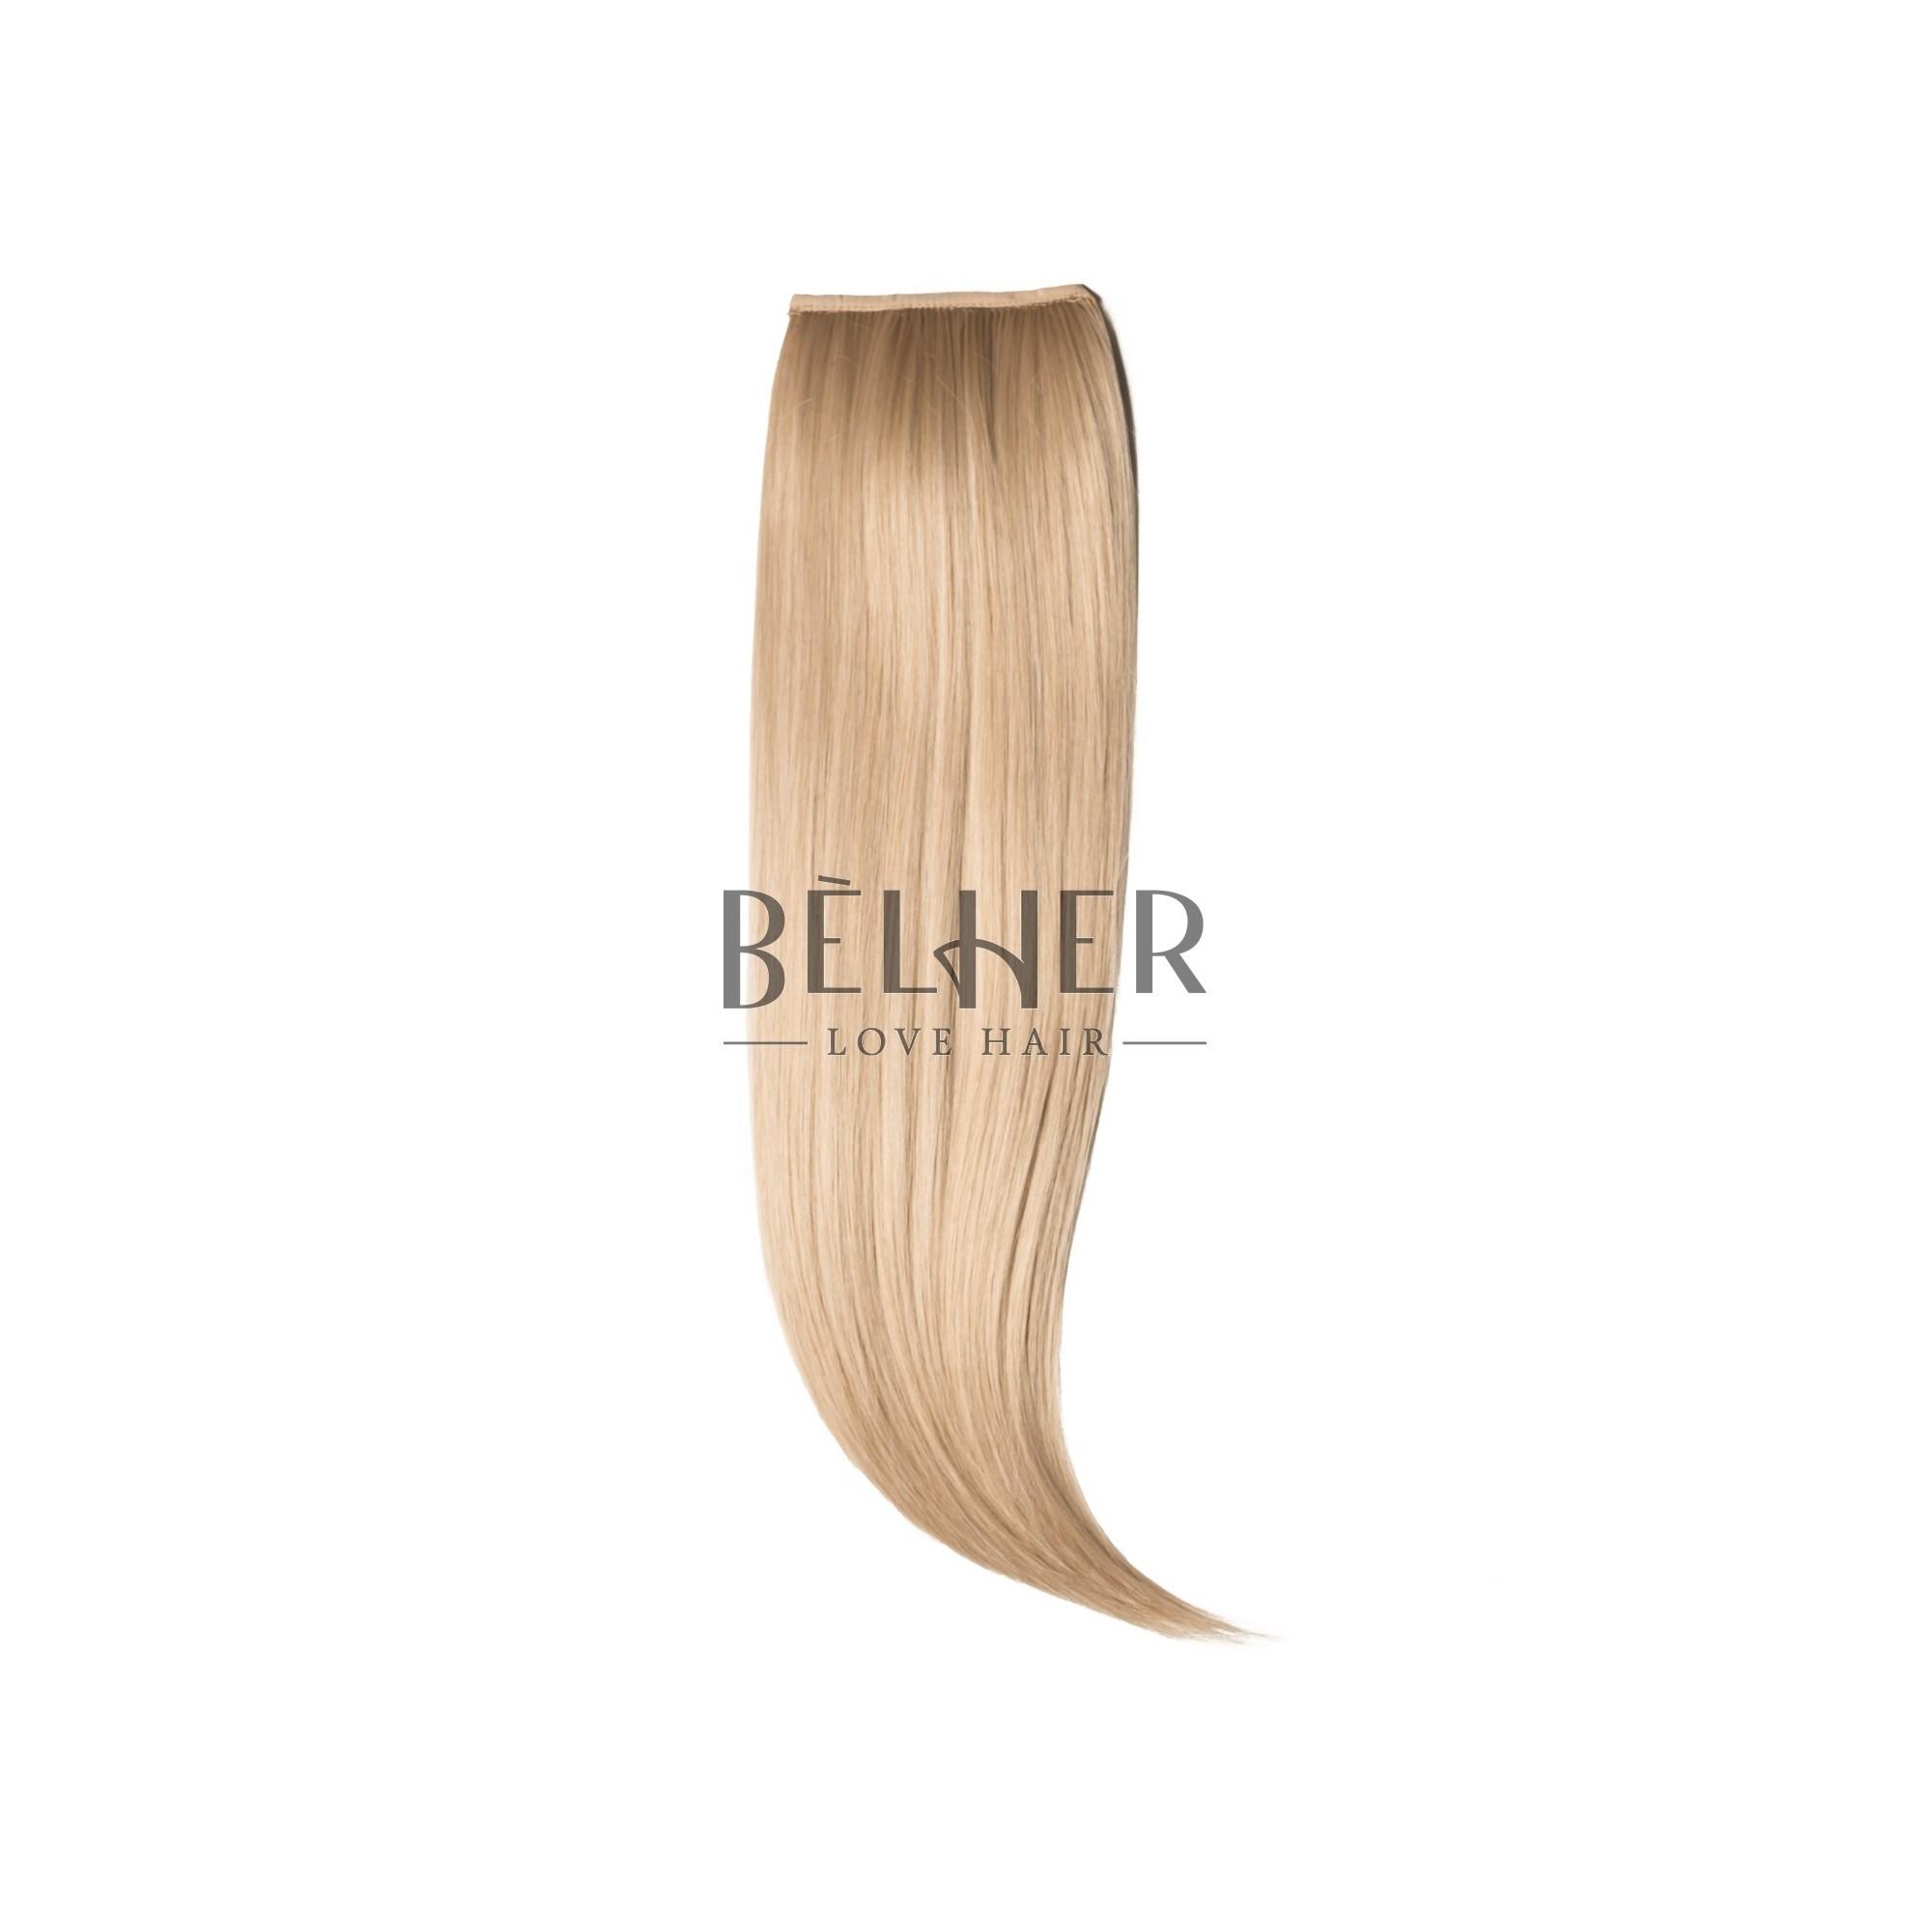 Coada Par Drept Blond Bej